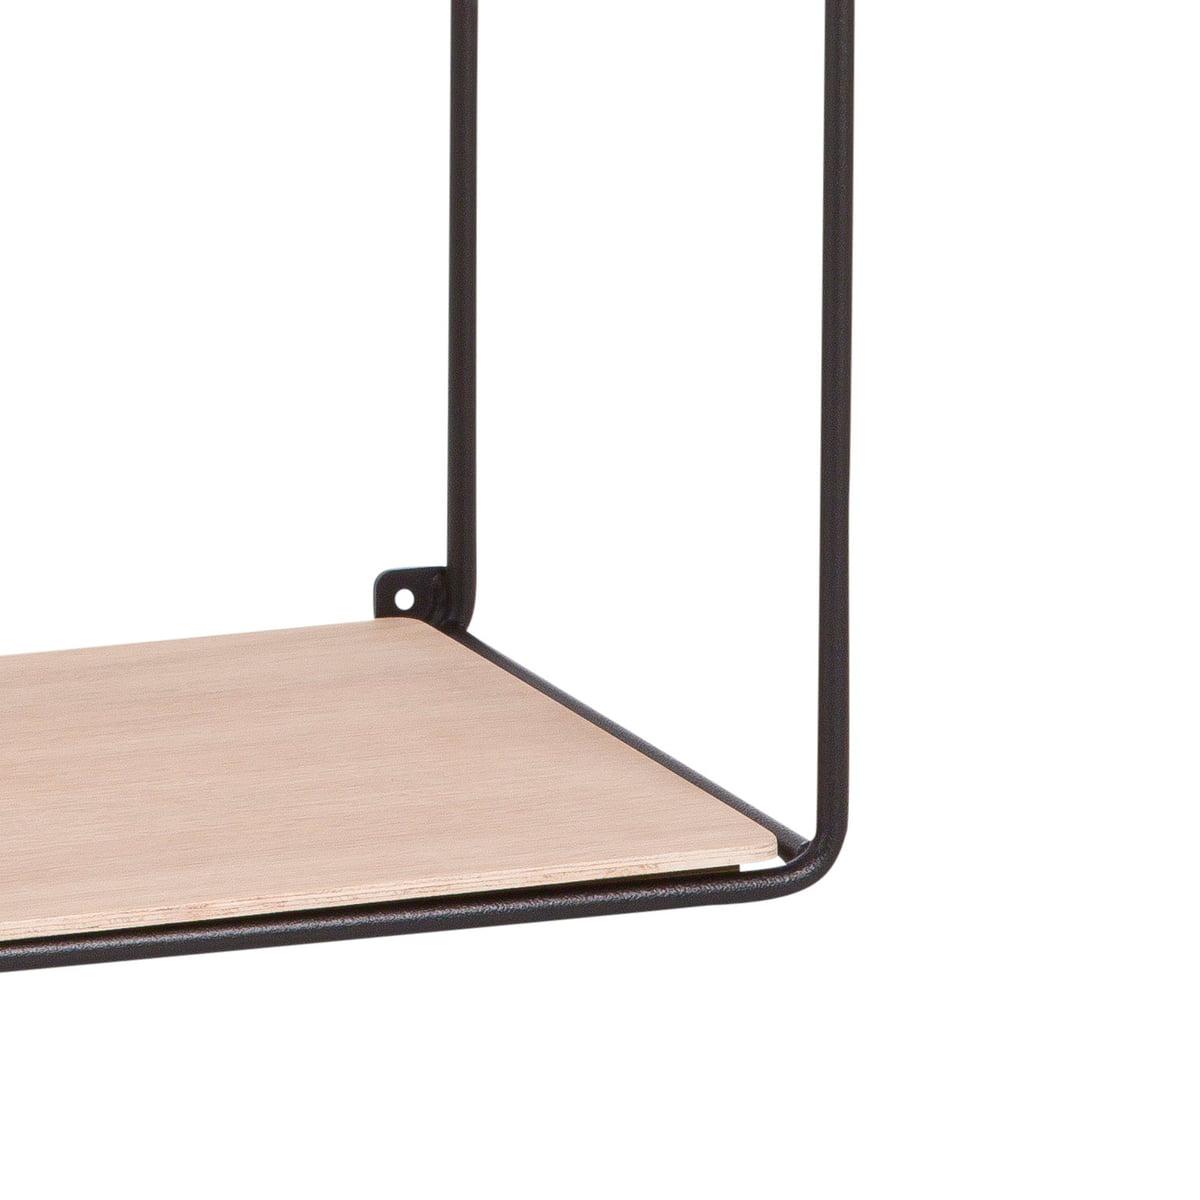 Anywhere 1x1 wall shelf by korridor connox for Connox com